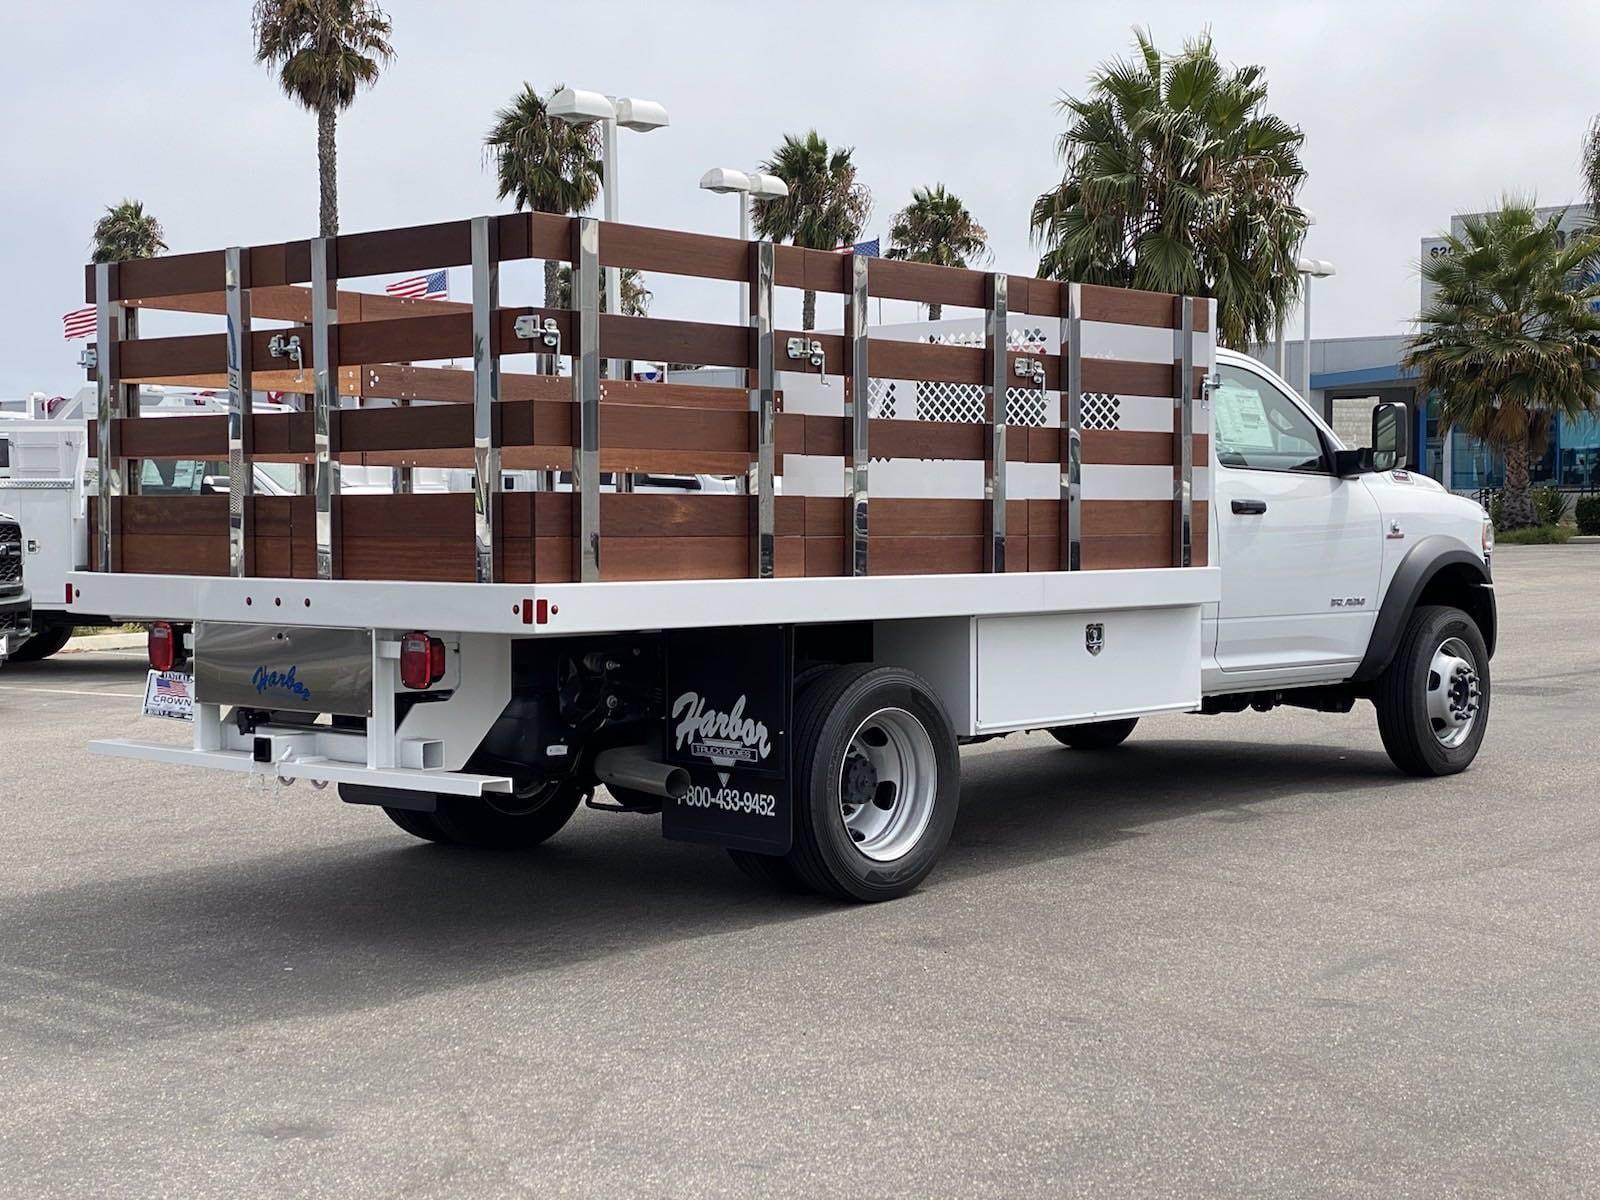 2020 Ram 5500 Regular Cab DRW 4x2, Harbor Stake Bed #H2239 - photo 1